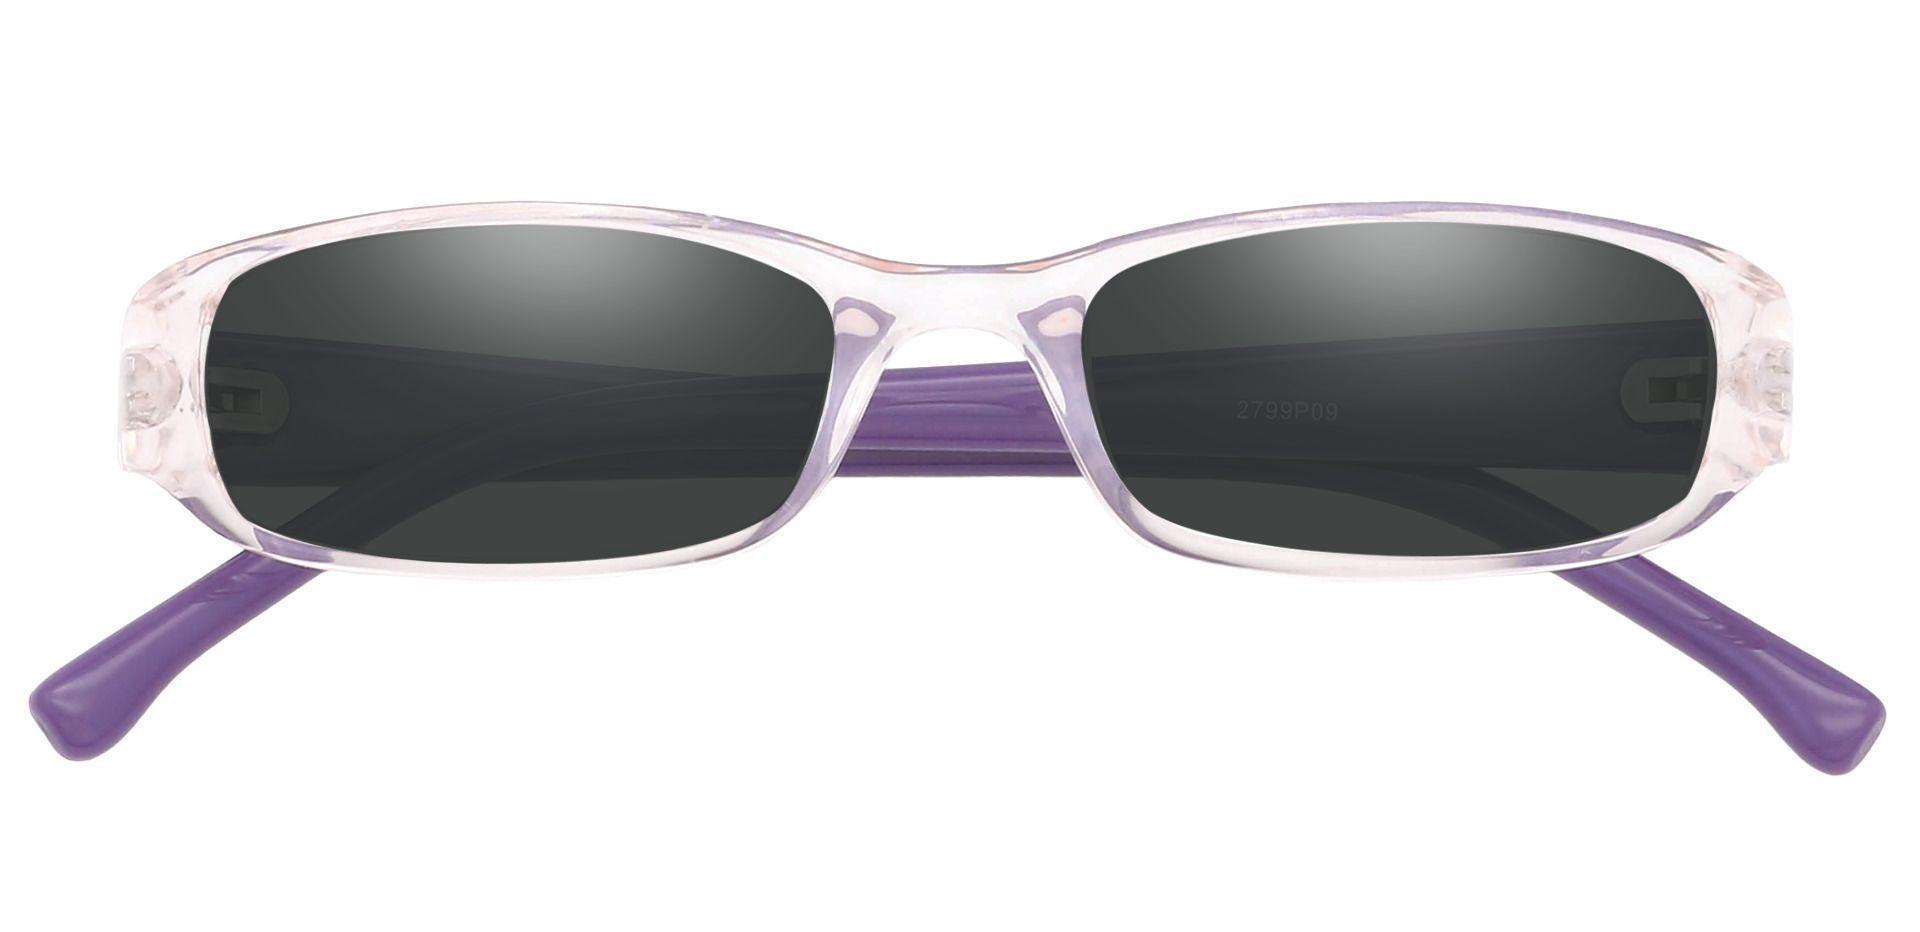 Laurel Rectangle Single Vision Sunglasses -  Purple Frame With Gray Lenses